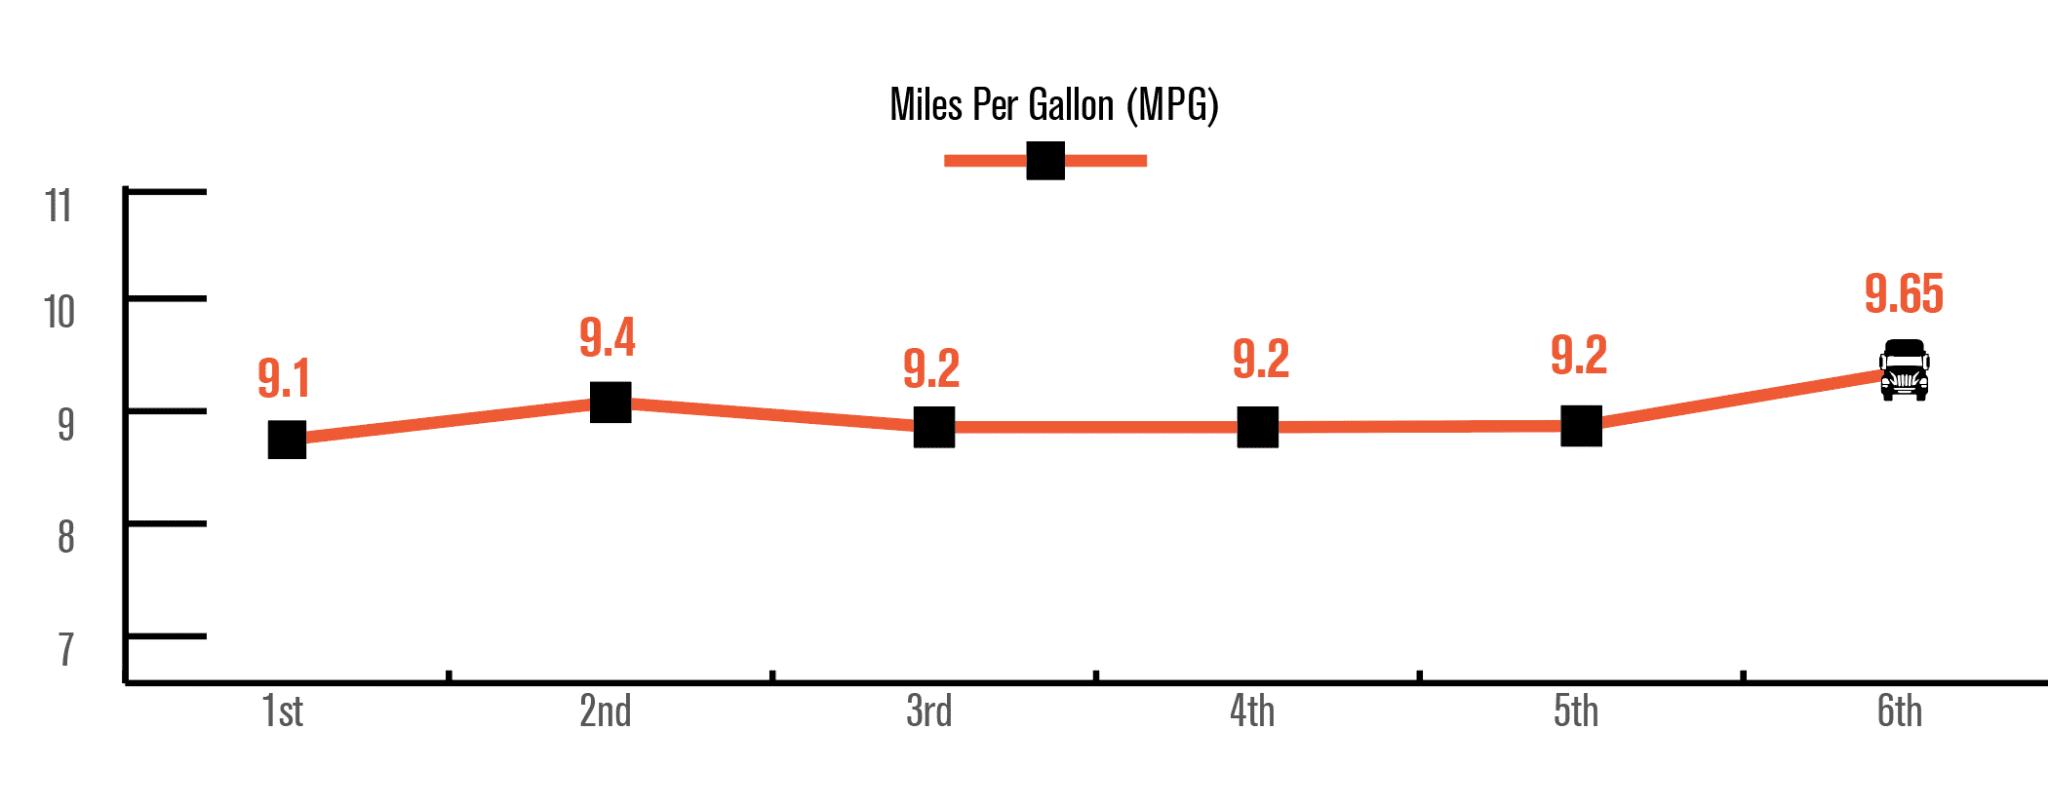 Nextgen C10 Race To 10 Mpg 6th Run Mpg Stats Fuel